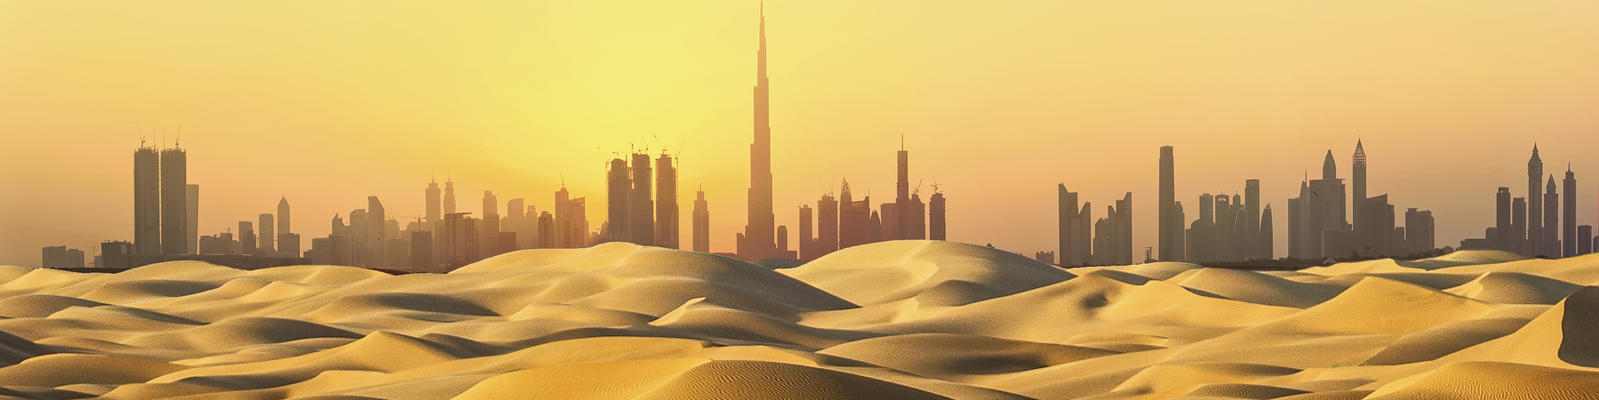 The Dubai skyline at sunset (Photo: WaitForLight/Shutterstock.com)